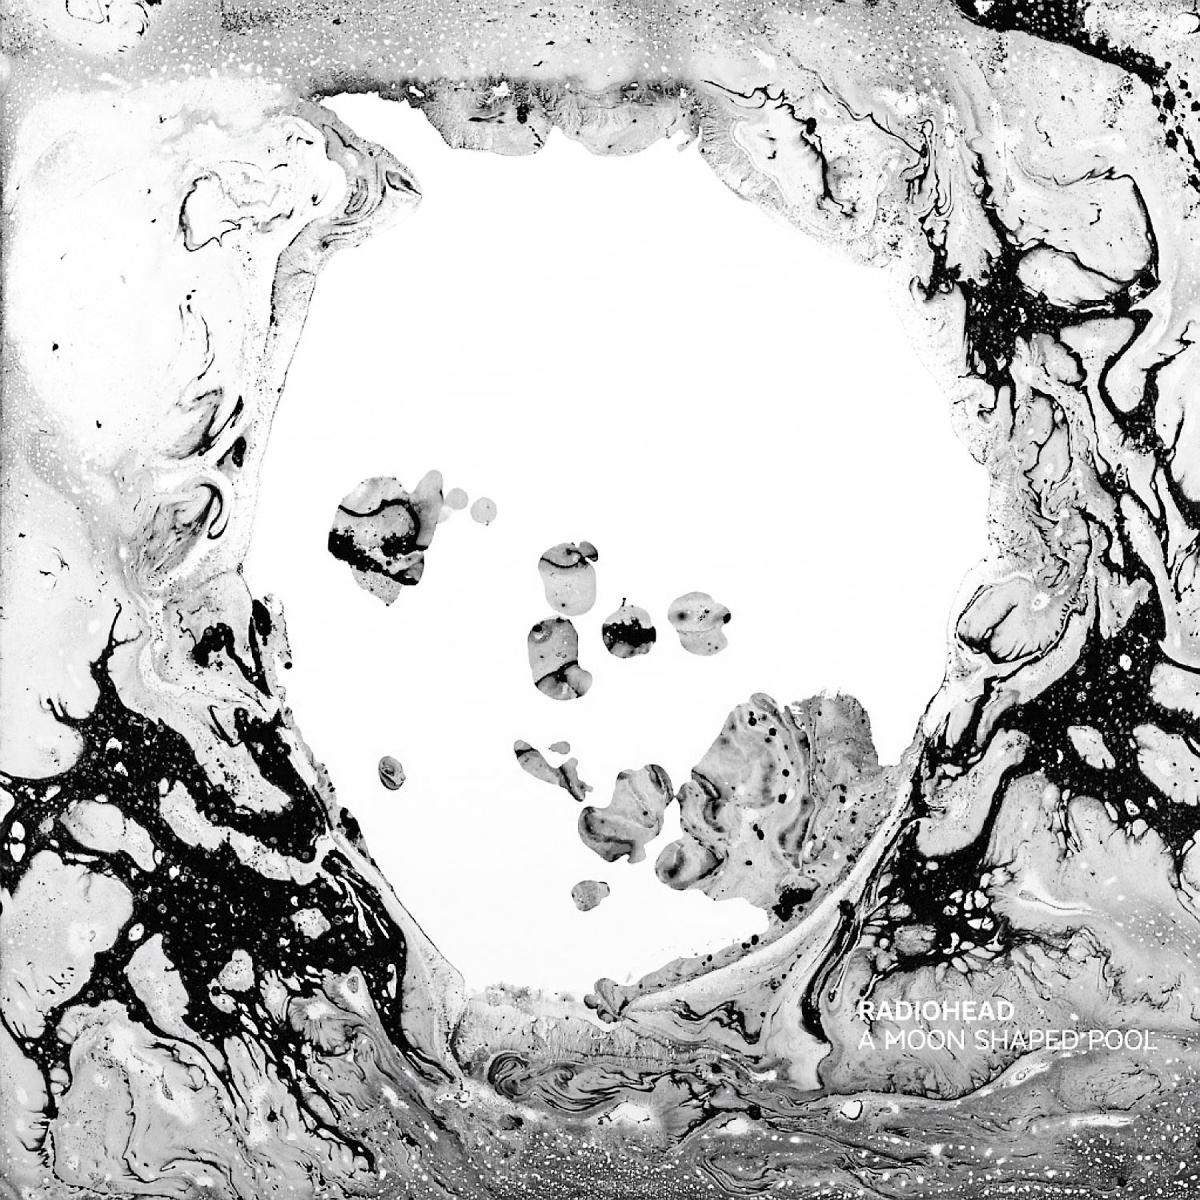 Radiohead: A Moon ShapedPool